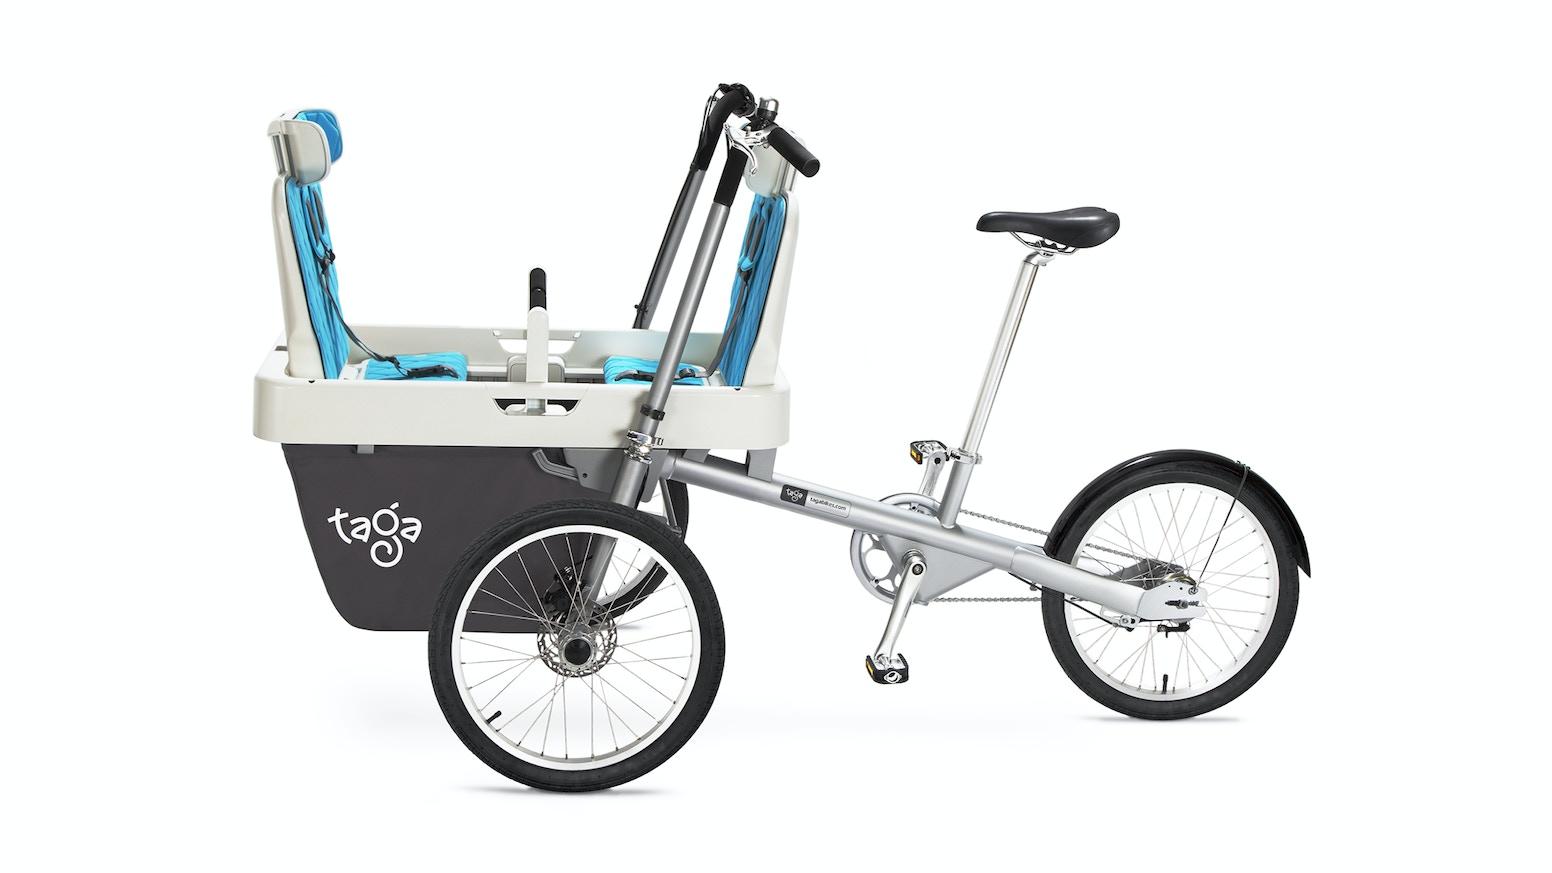 Taga 2 0 The Ultimate Most Affordable Family Bike By Taga Usa